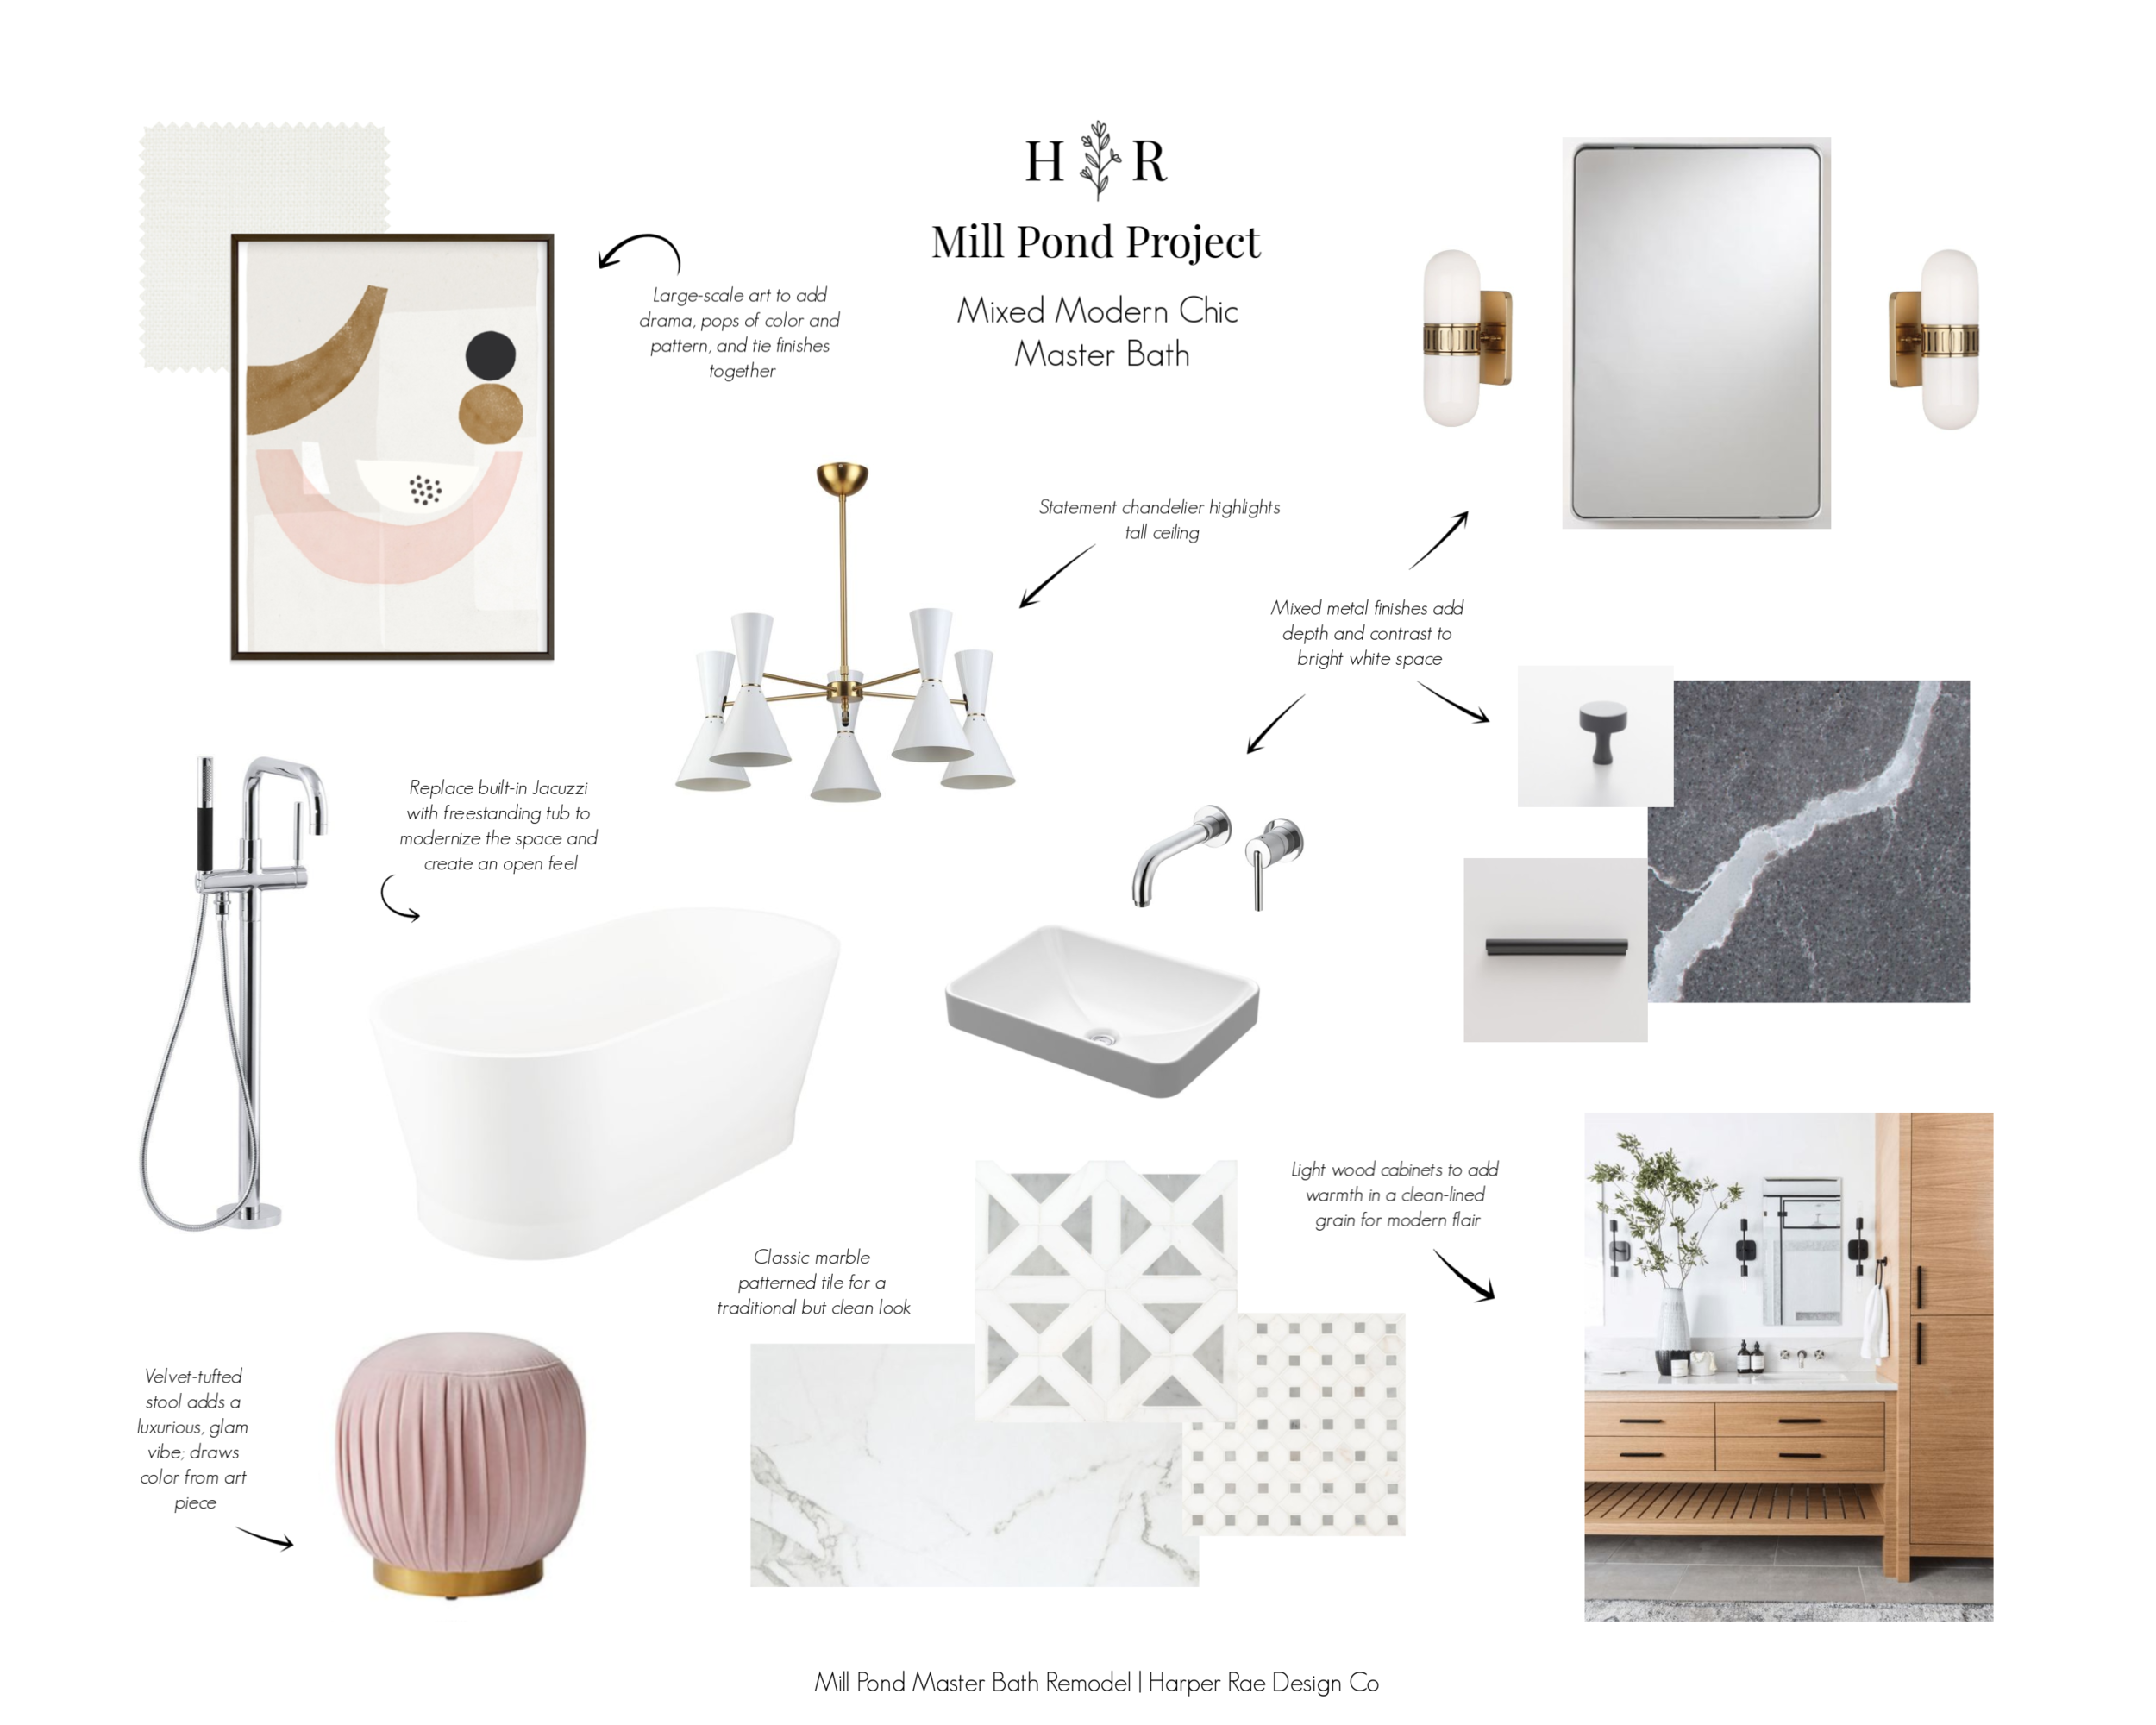 Mixed Modern Master Bath Design Concept by Harper Rae Design Co.png